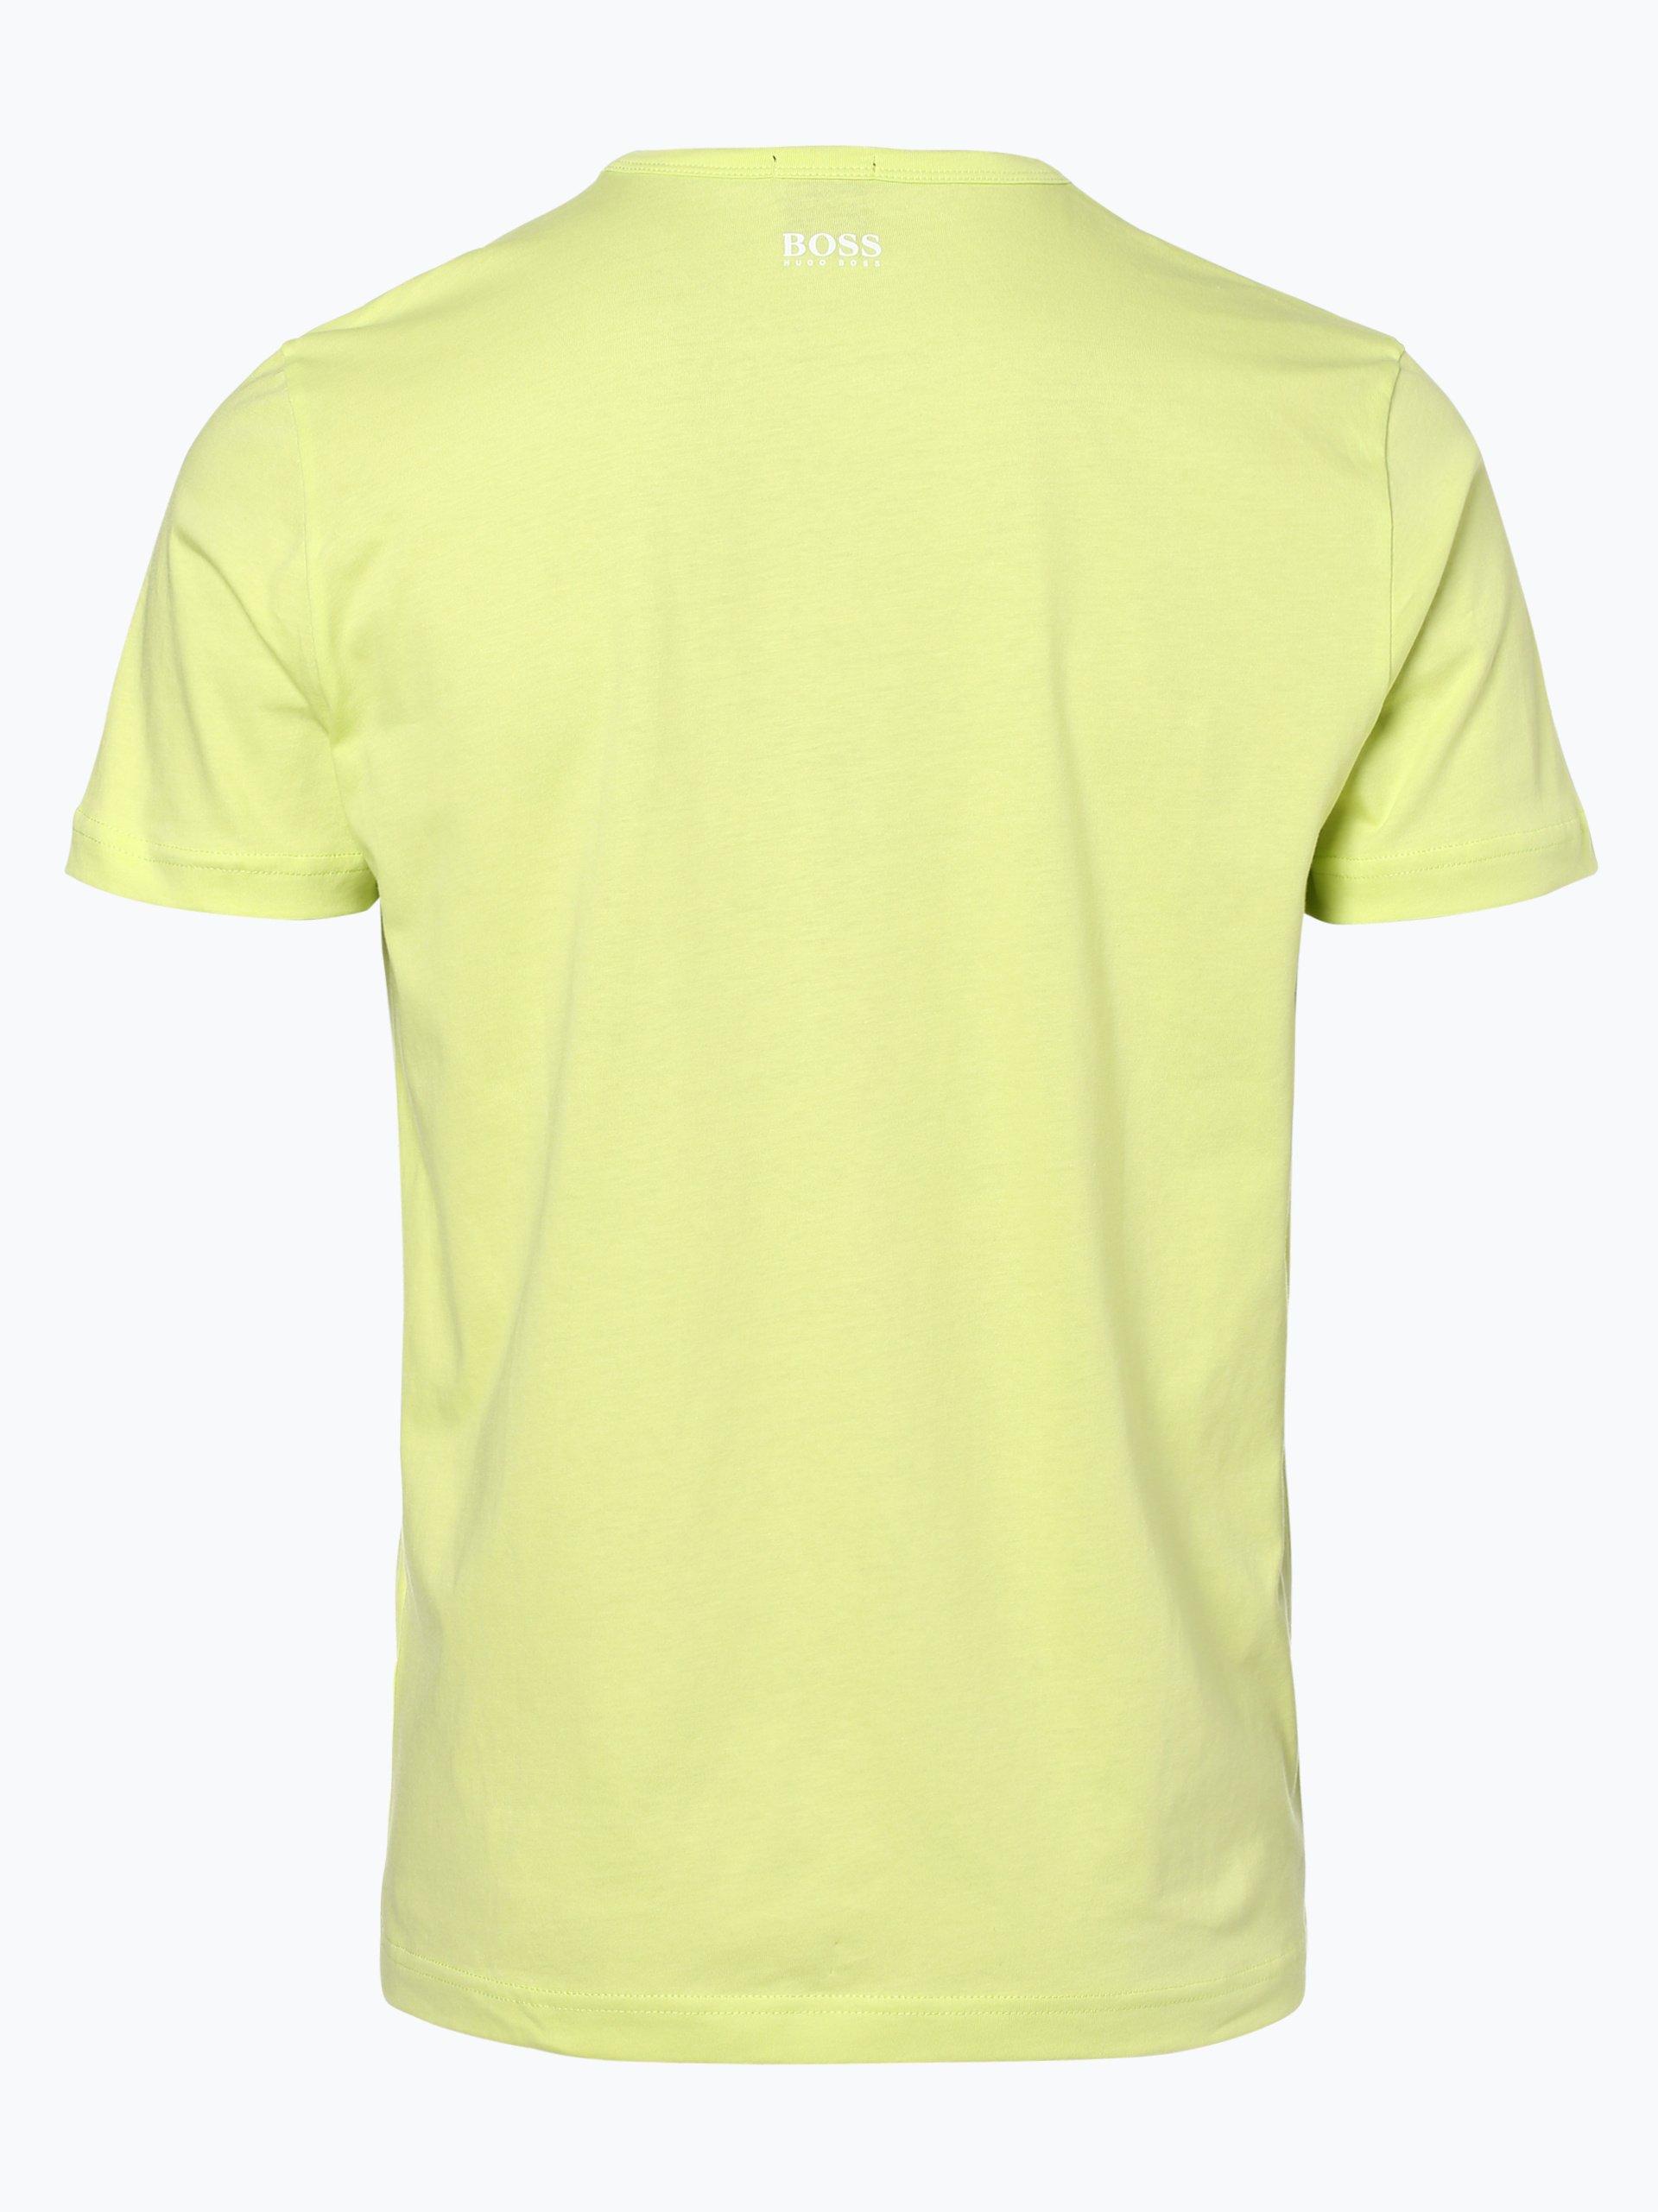 boss athleisure herren t shirt tee 1 gelb limone uni. Black Bedroom Furniture Sets. Home Design Ideas